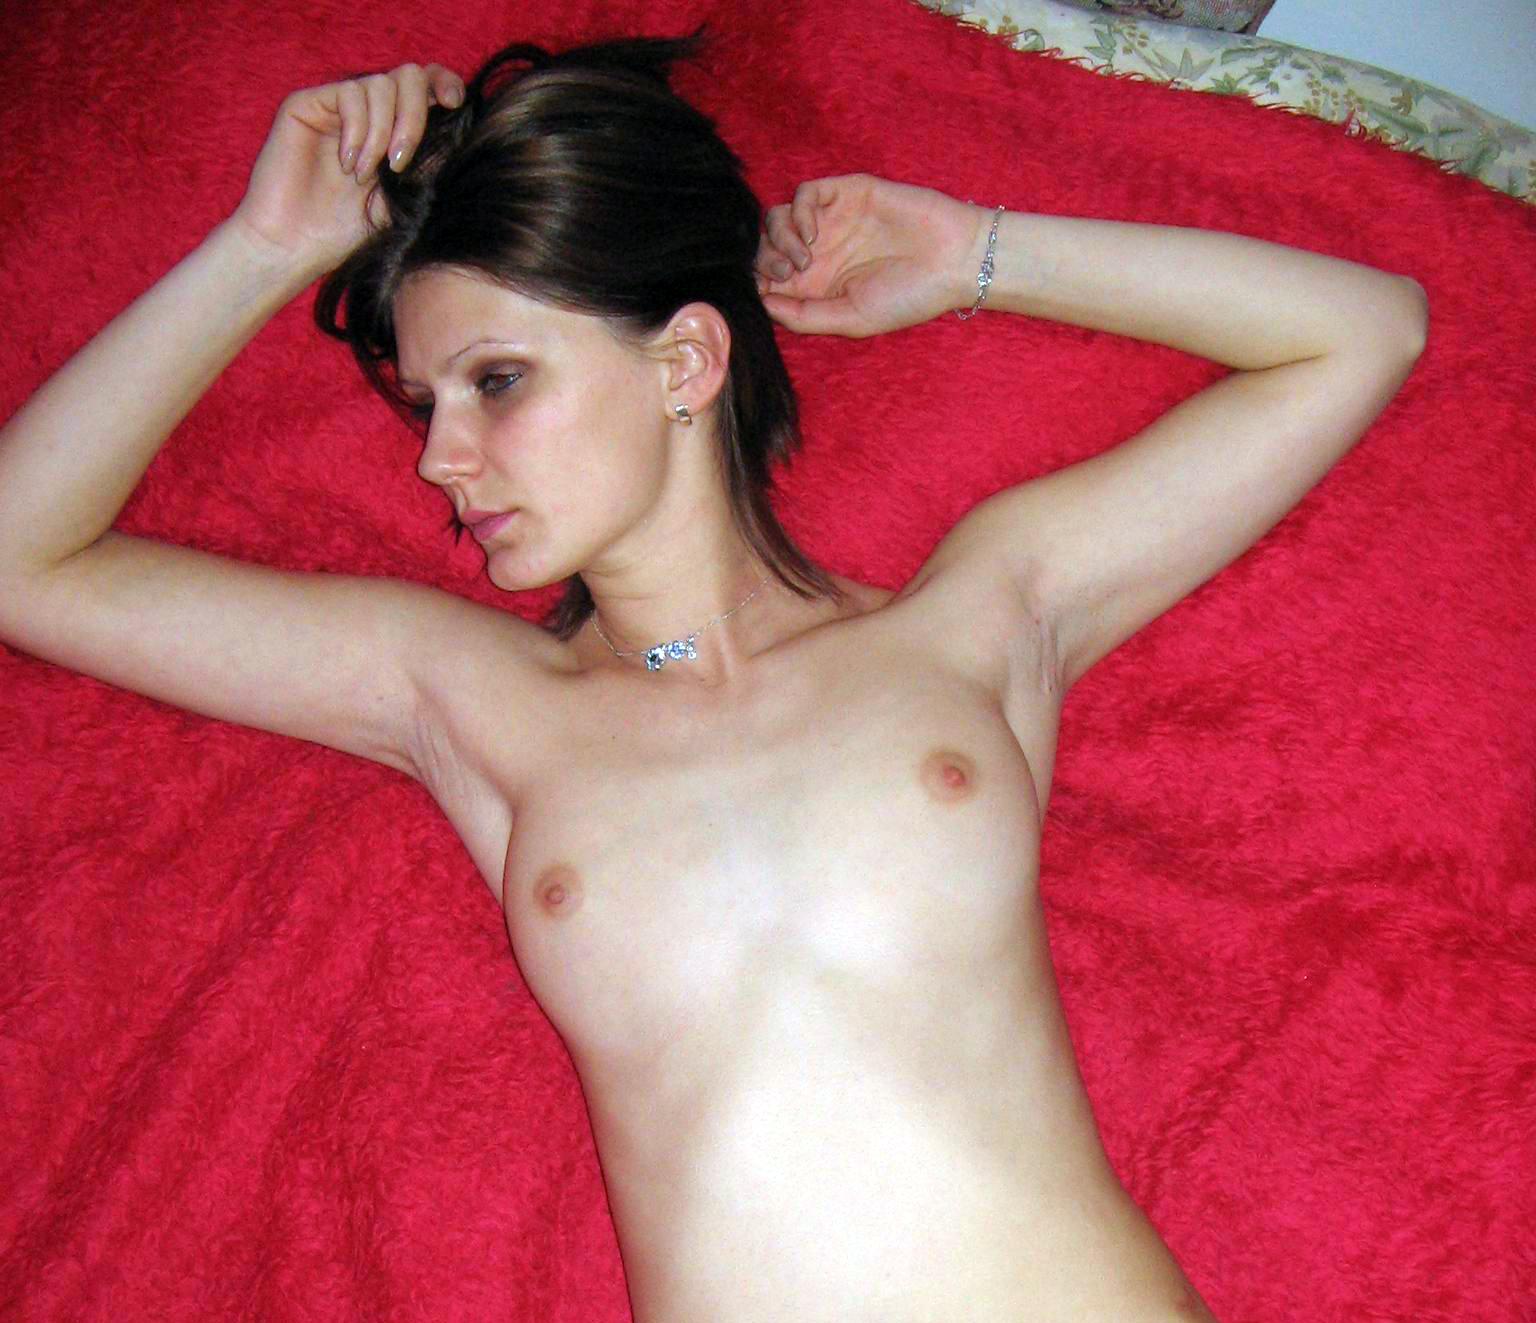 Yuvi pallares strips naked